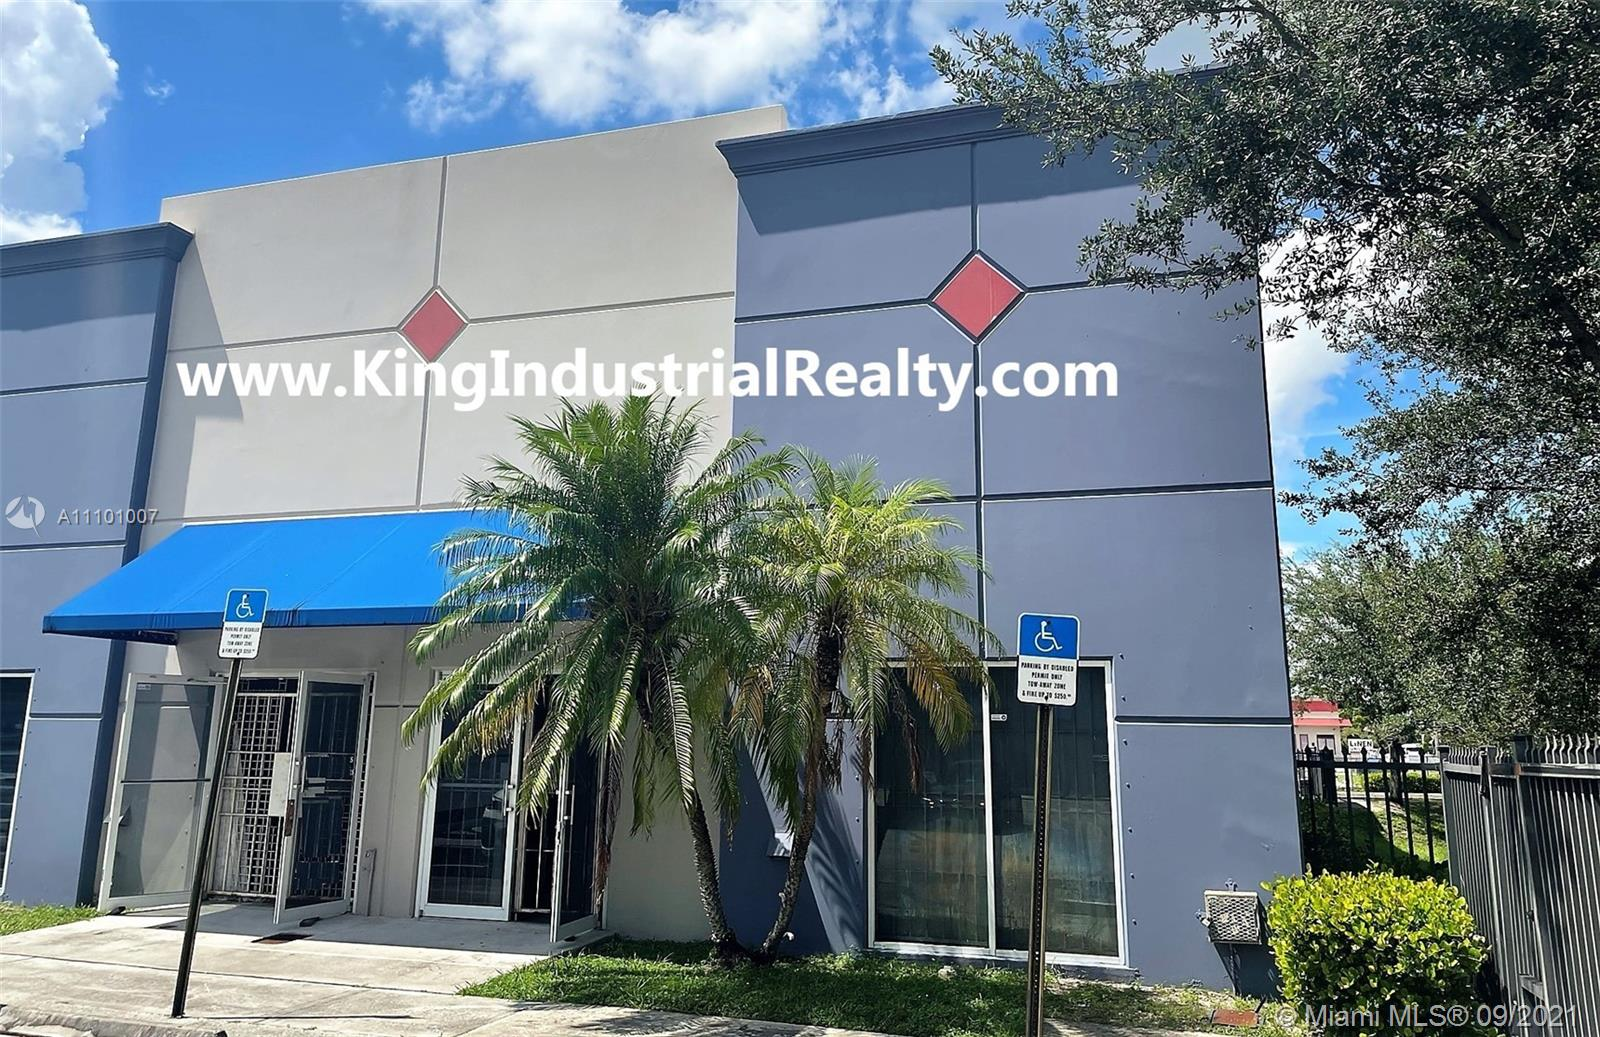 4980 NW 165th St, Miami Gardens, FL 33014